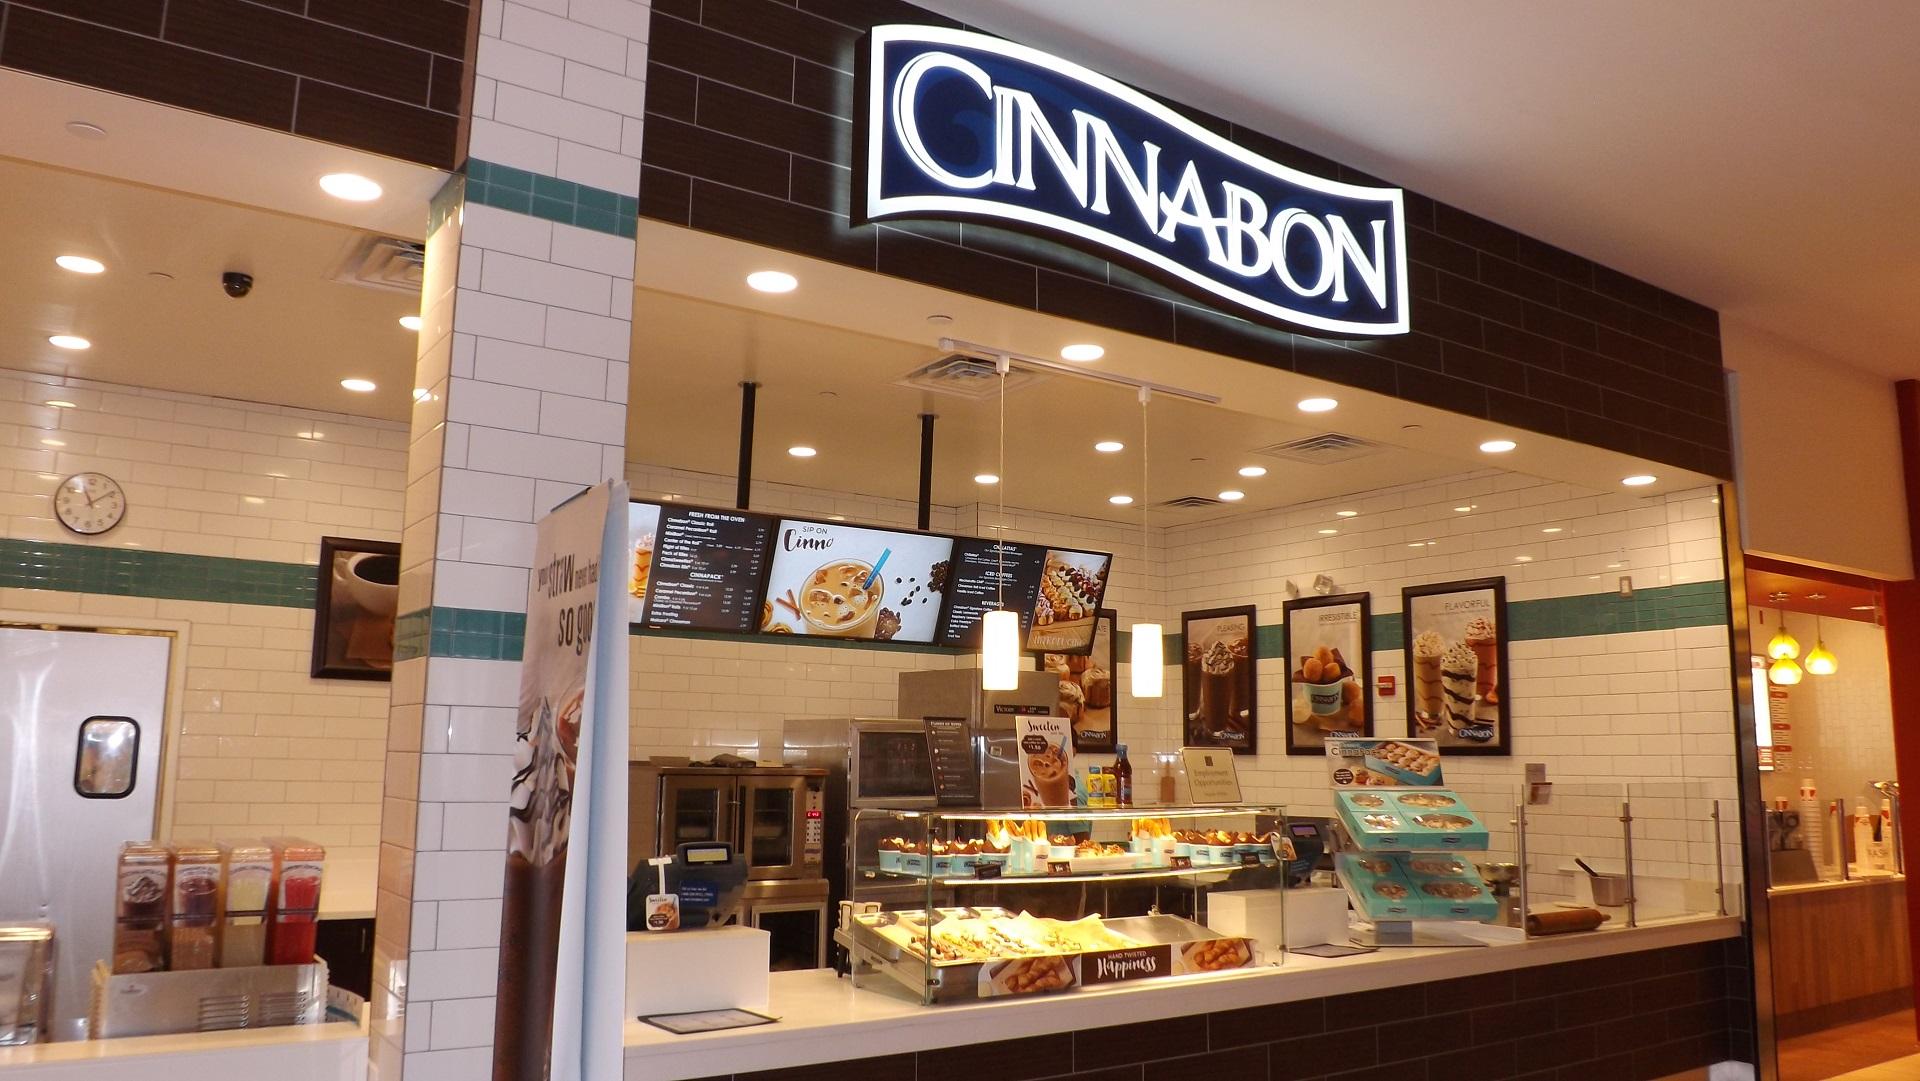 Cinnabon aroma